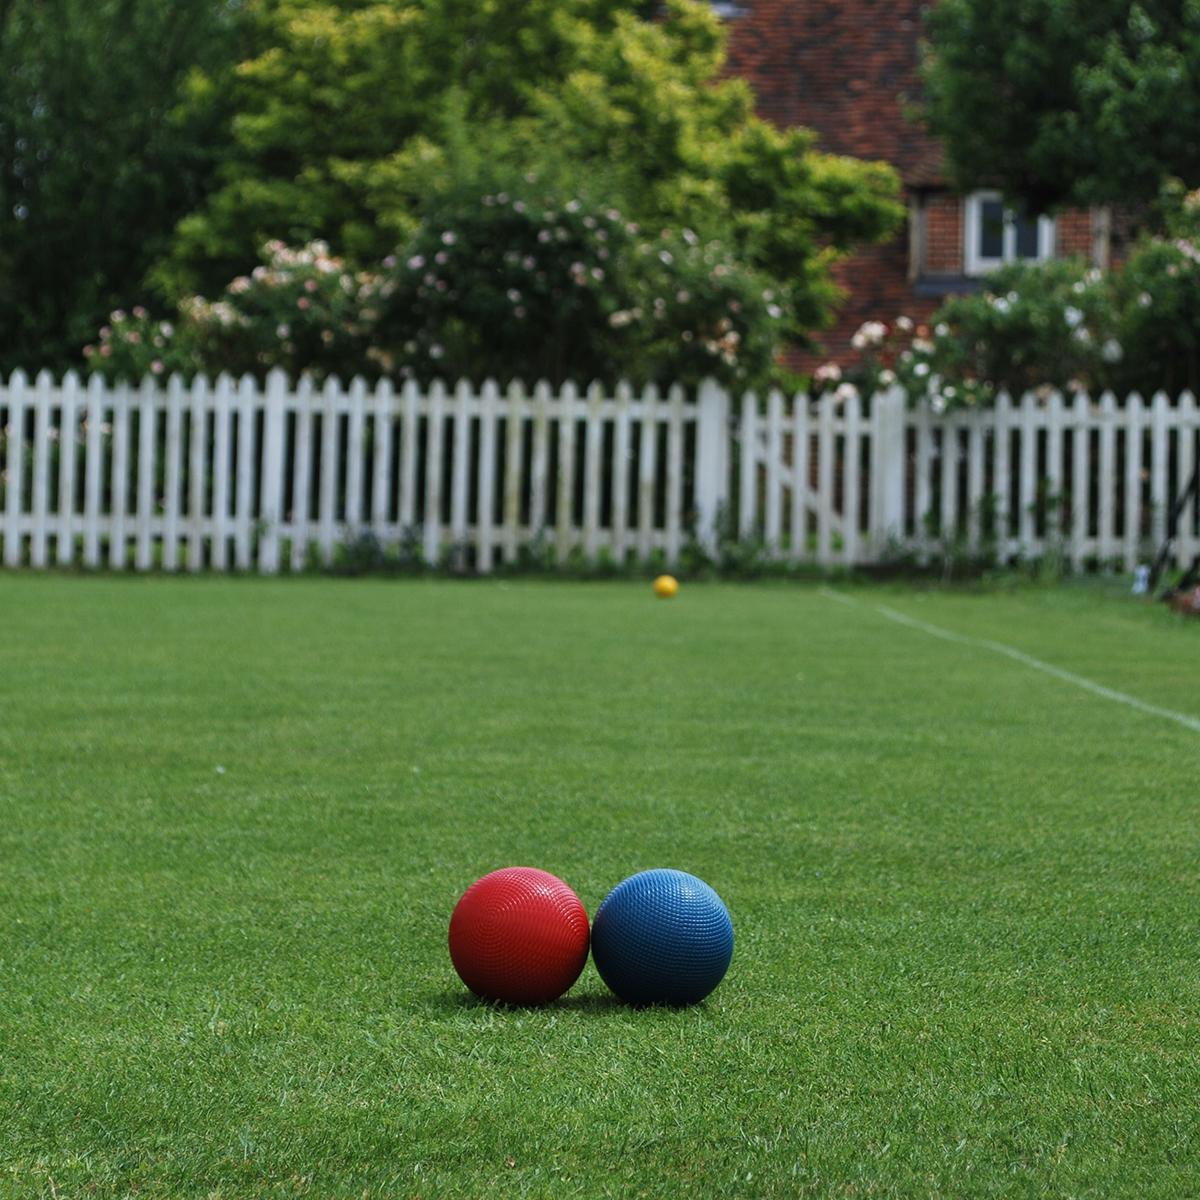 Balls set for Take-off